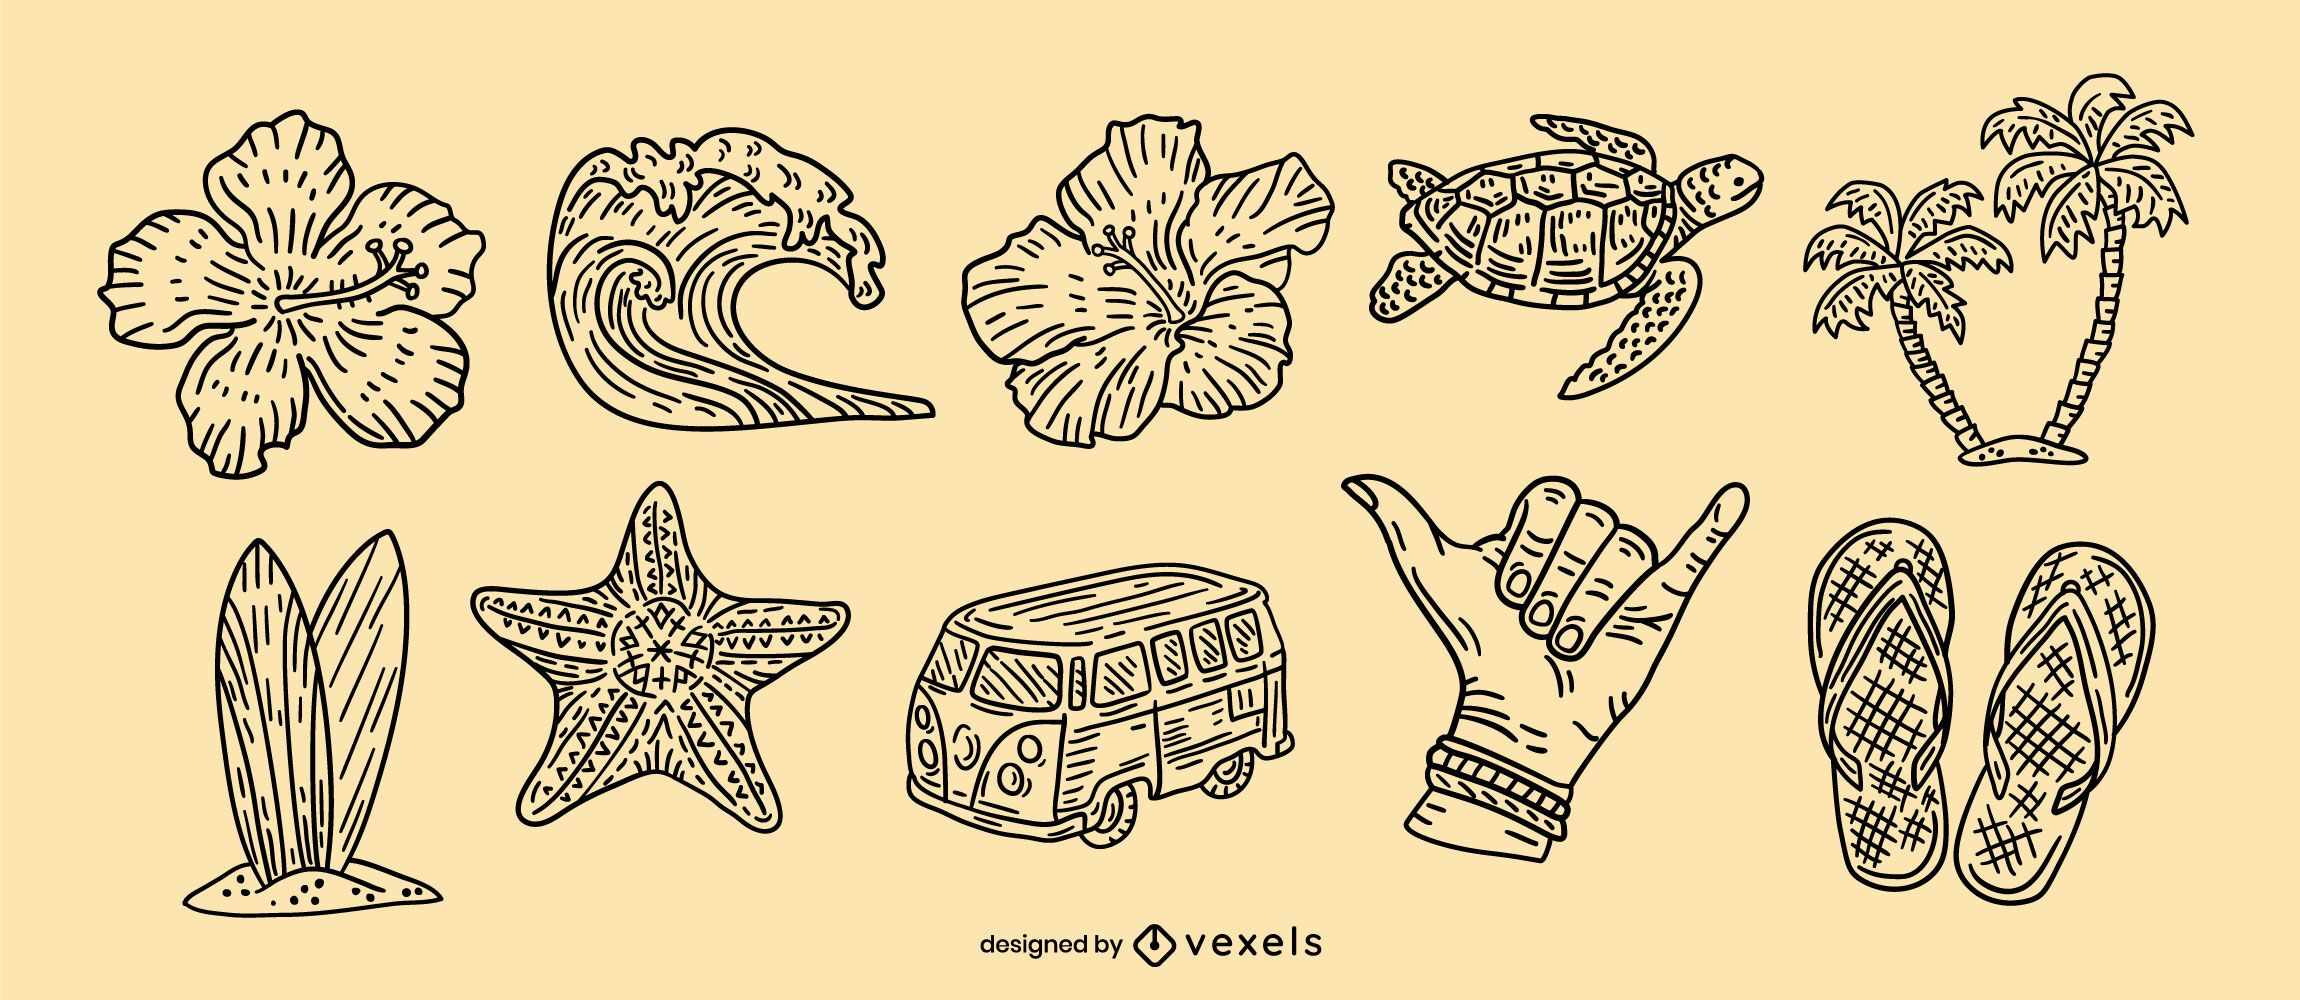 Hawaii hand-drawn element set